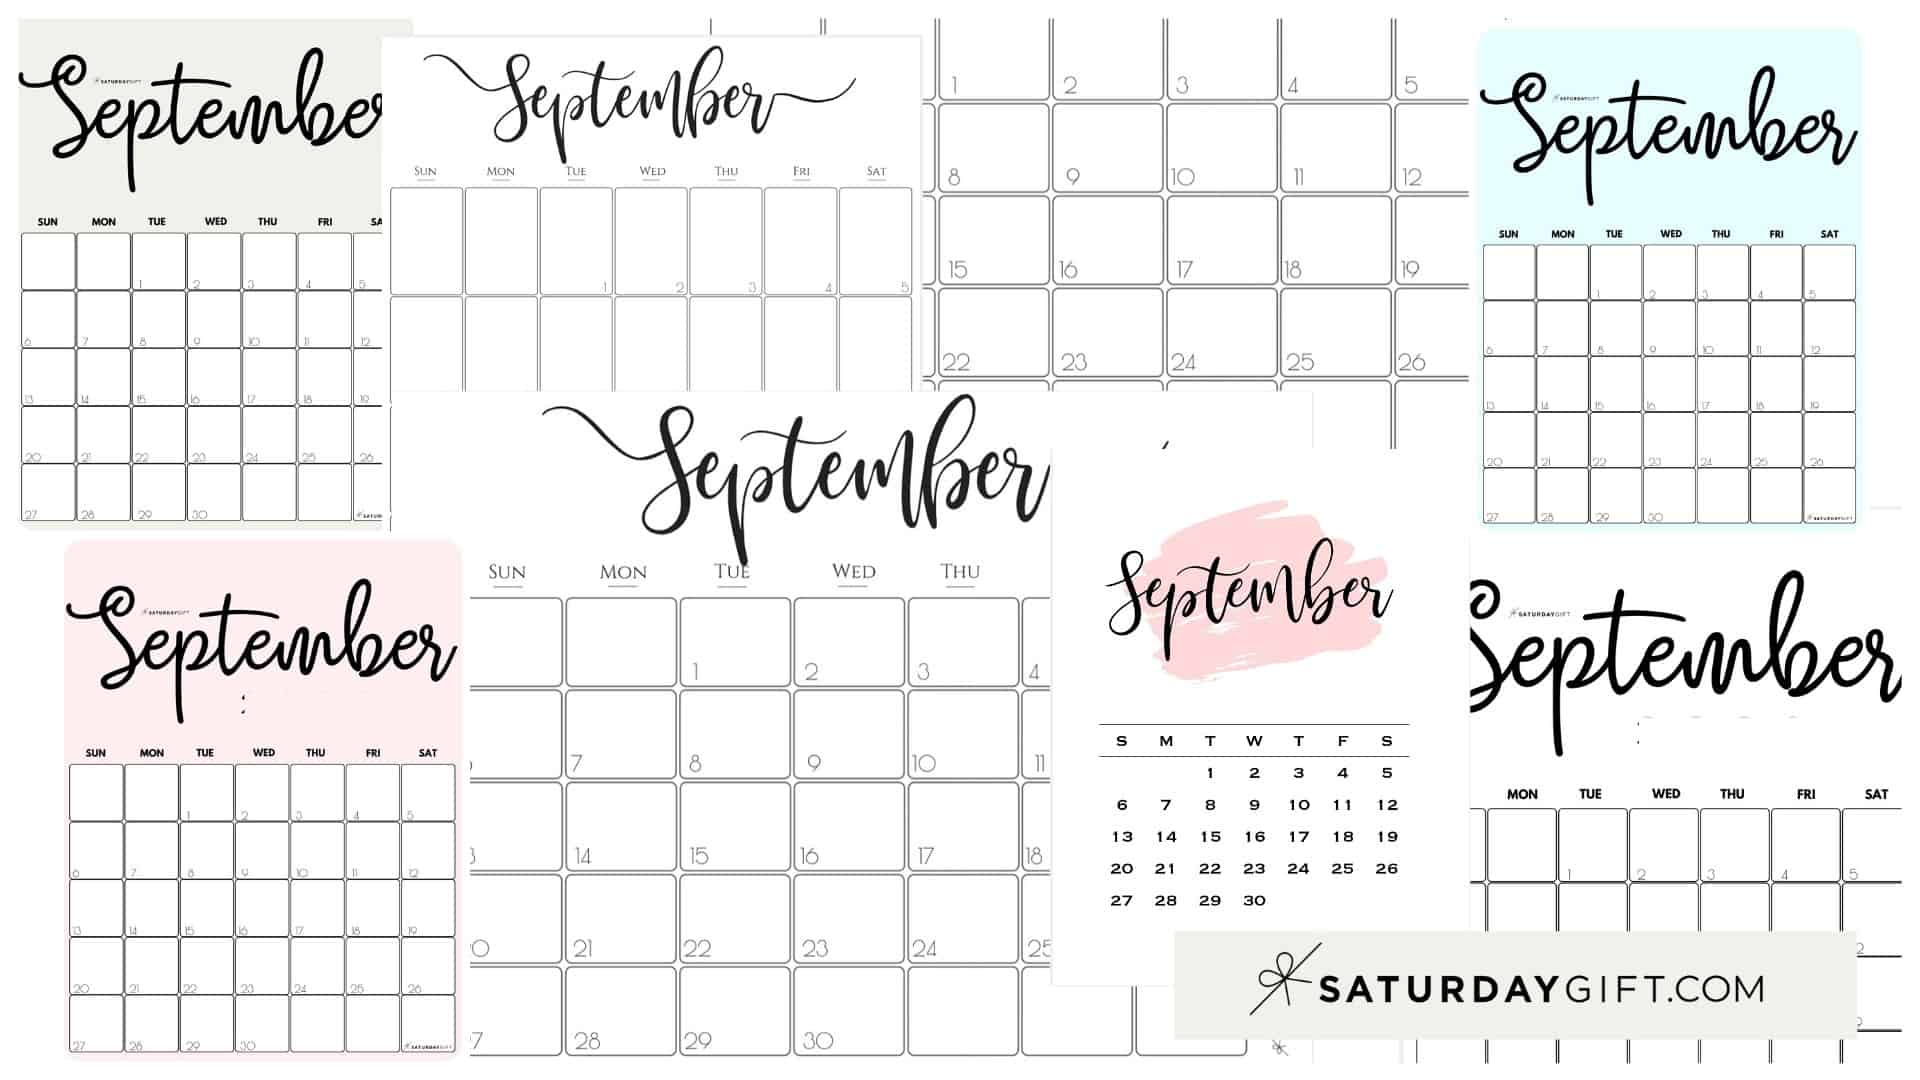 September 2022 Calendar Wallpaper.Cute Free Printable September 2021 Calendar Saturdaygift